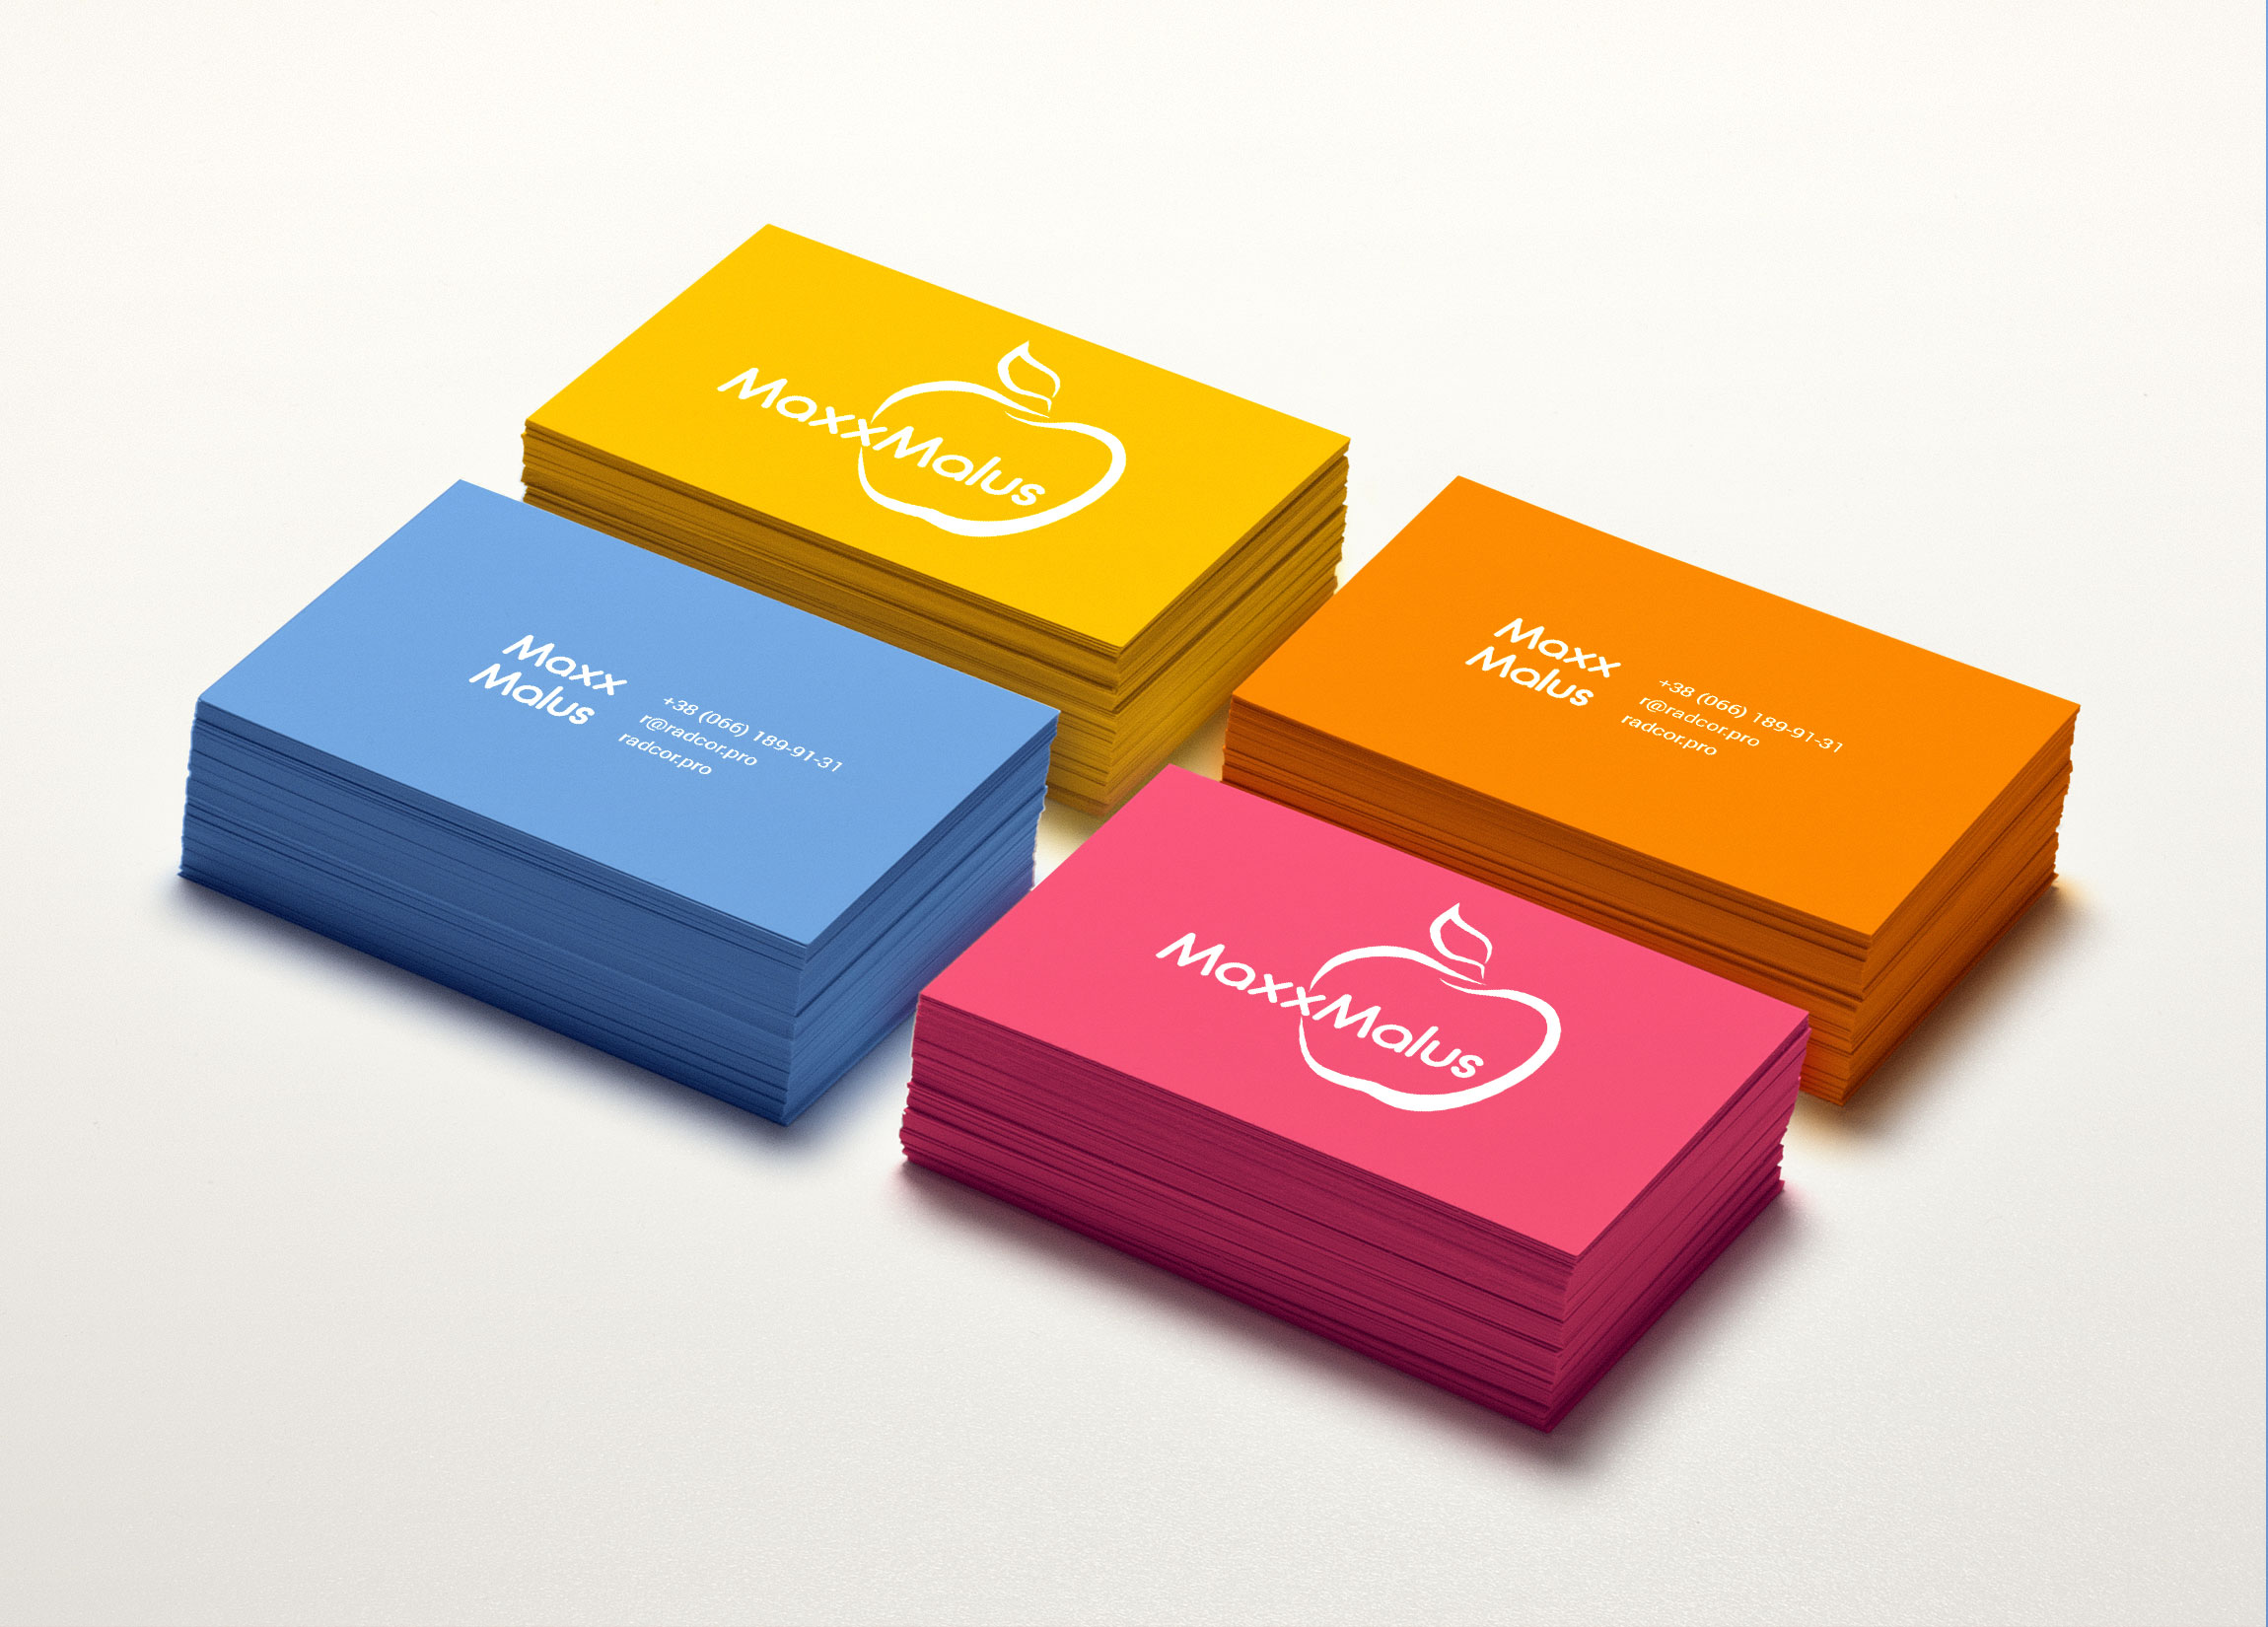 Логотип для нового бренда повседневной посуды фото f_3925b994f4f42369.jpg